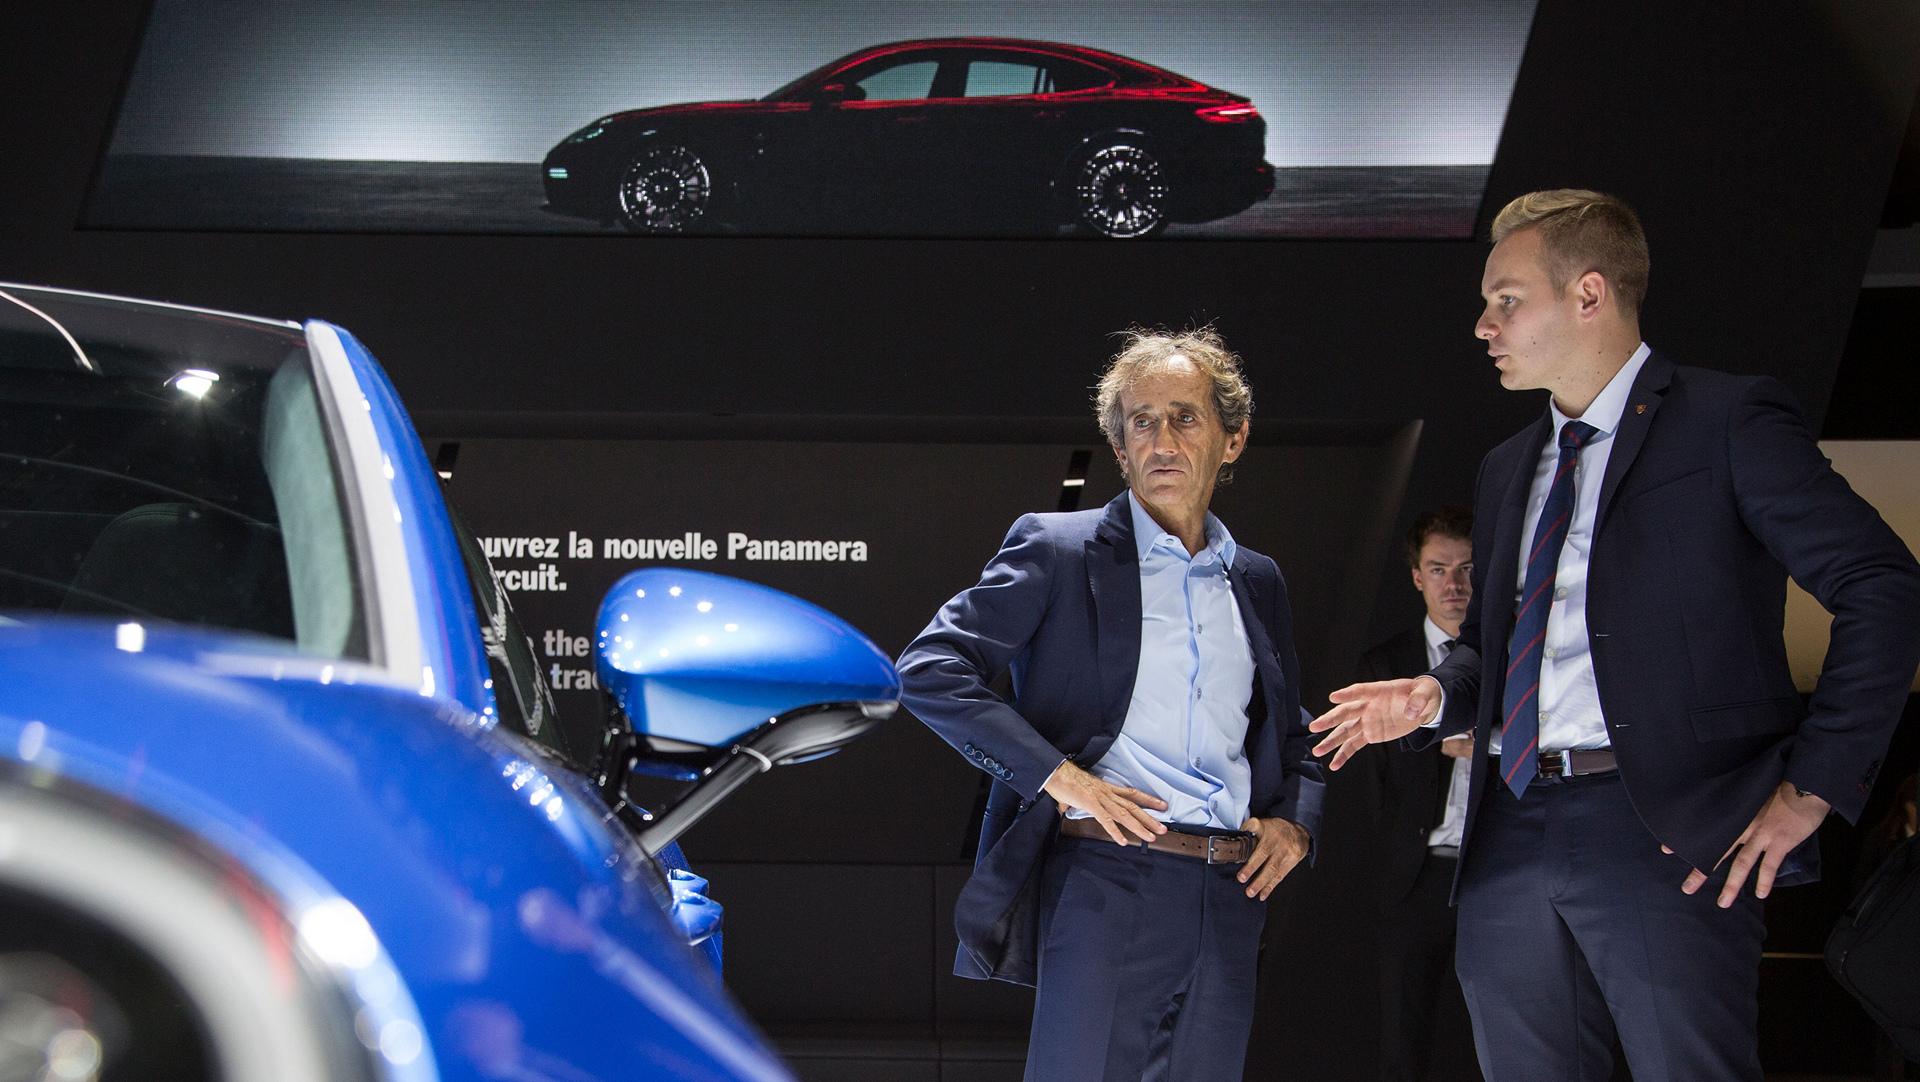 Alain Prost (l), race driver, Porsche Panamera 4 E-Hybrid © Dr. Ing. h.c. F. Porsche AG